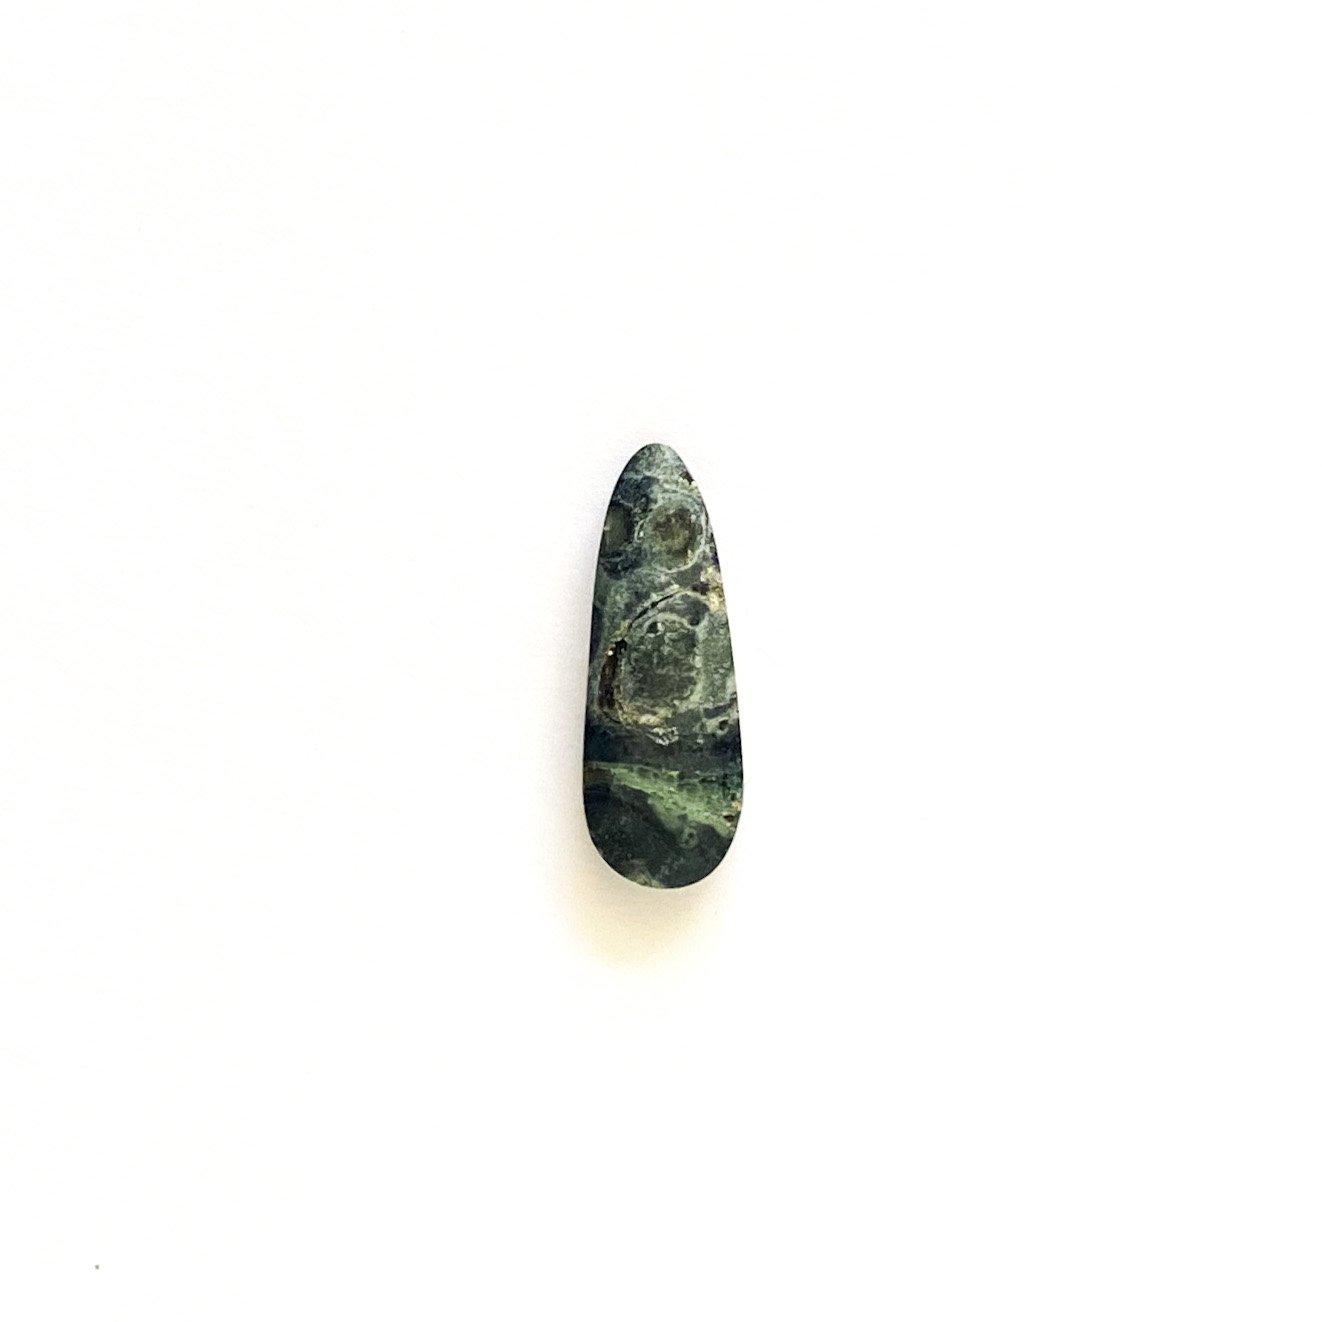 jasper cabochon loose lapidary cabochon gemstone #913 coffin shape cabochon kambaba jasper cabochon